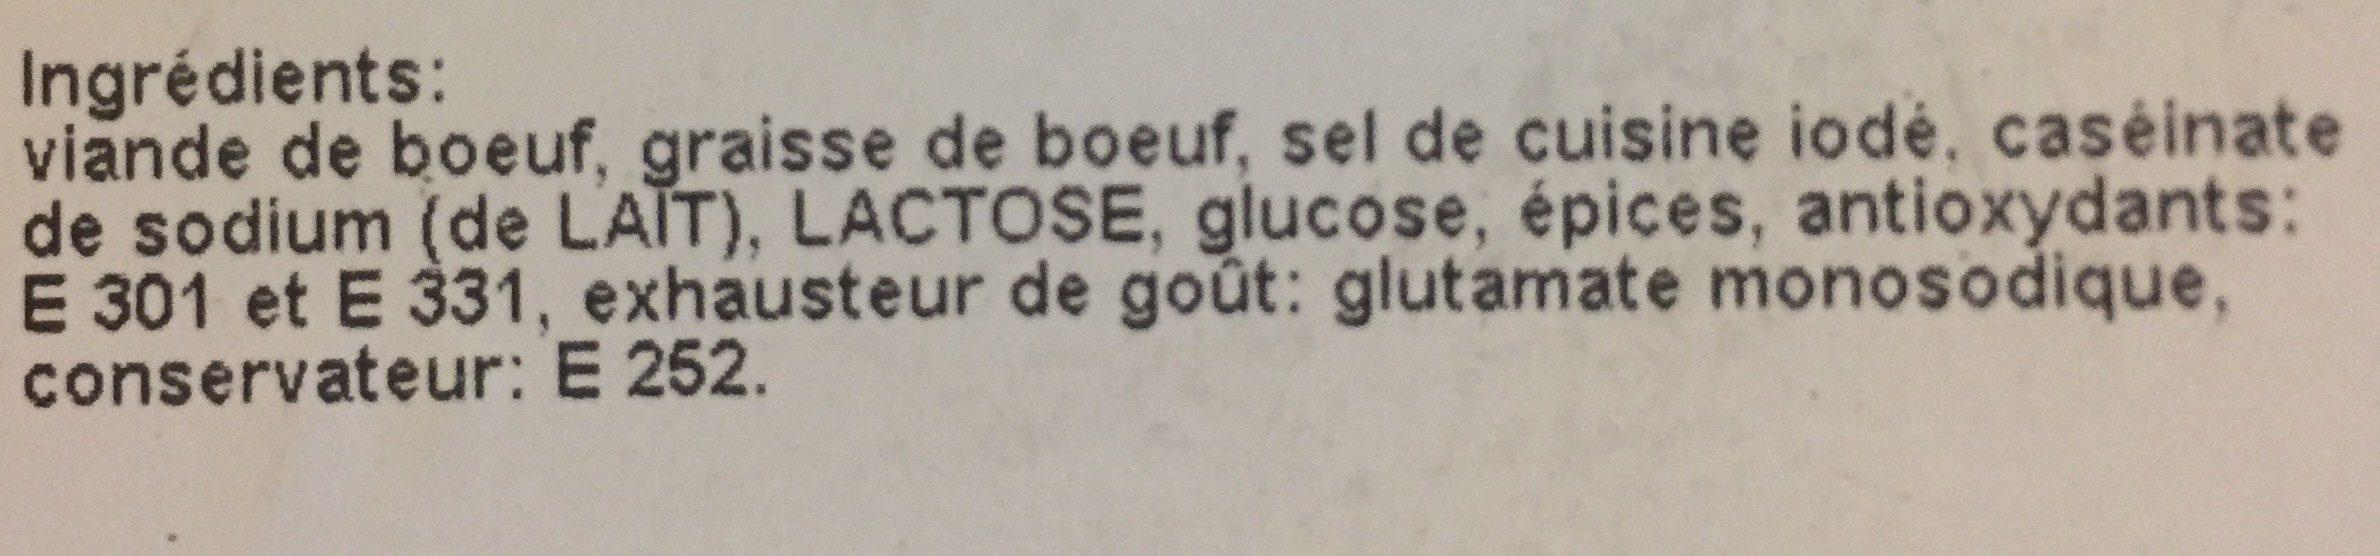 Salami de boeuf - Ingredients - fr